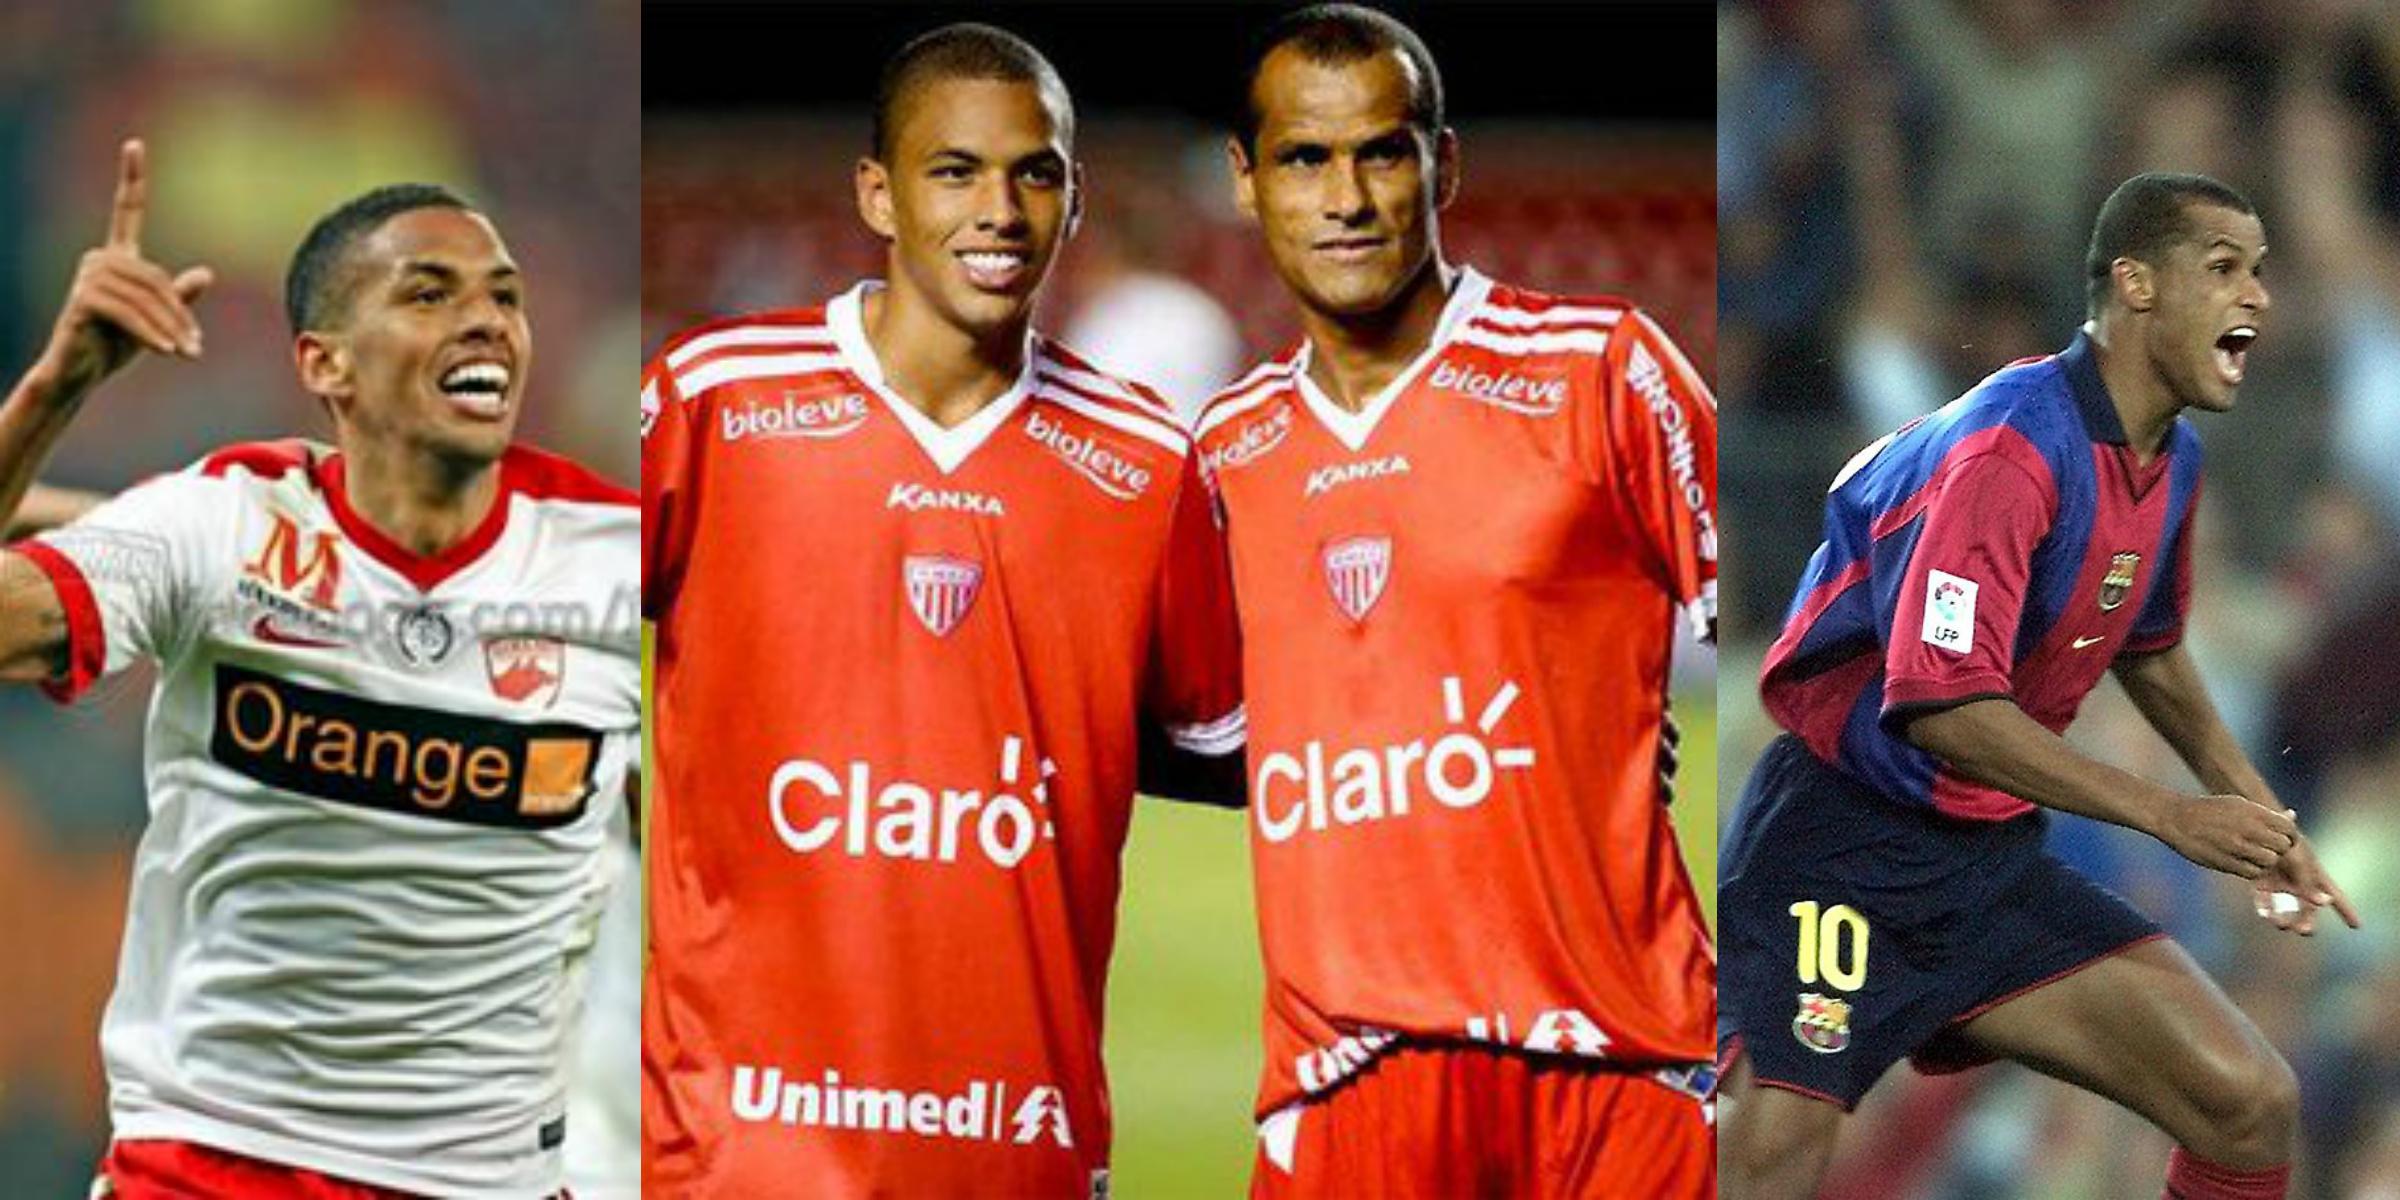 Rivaldo and Rivaldinho